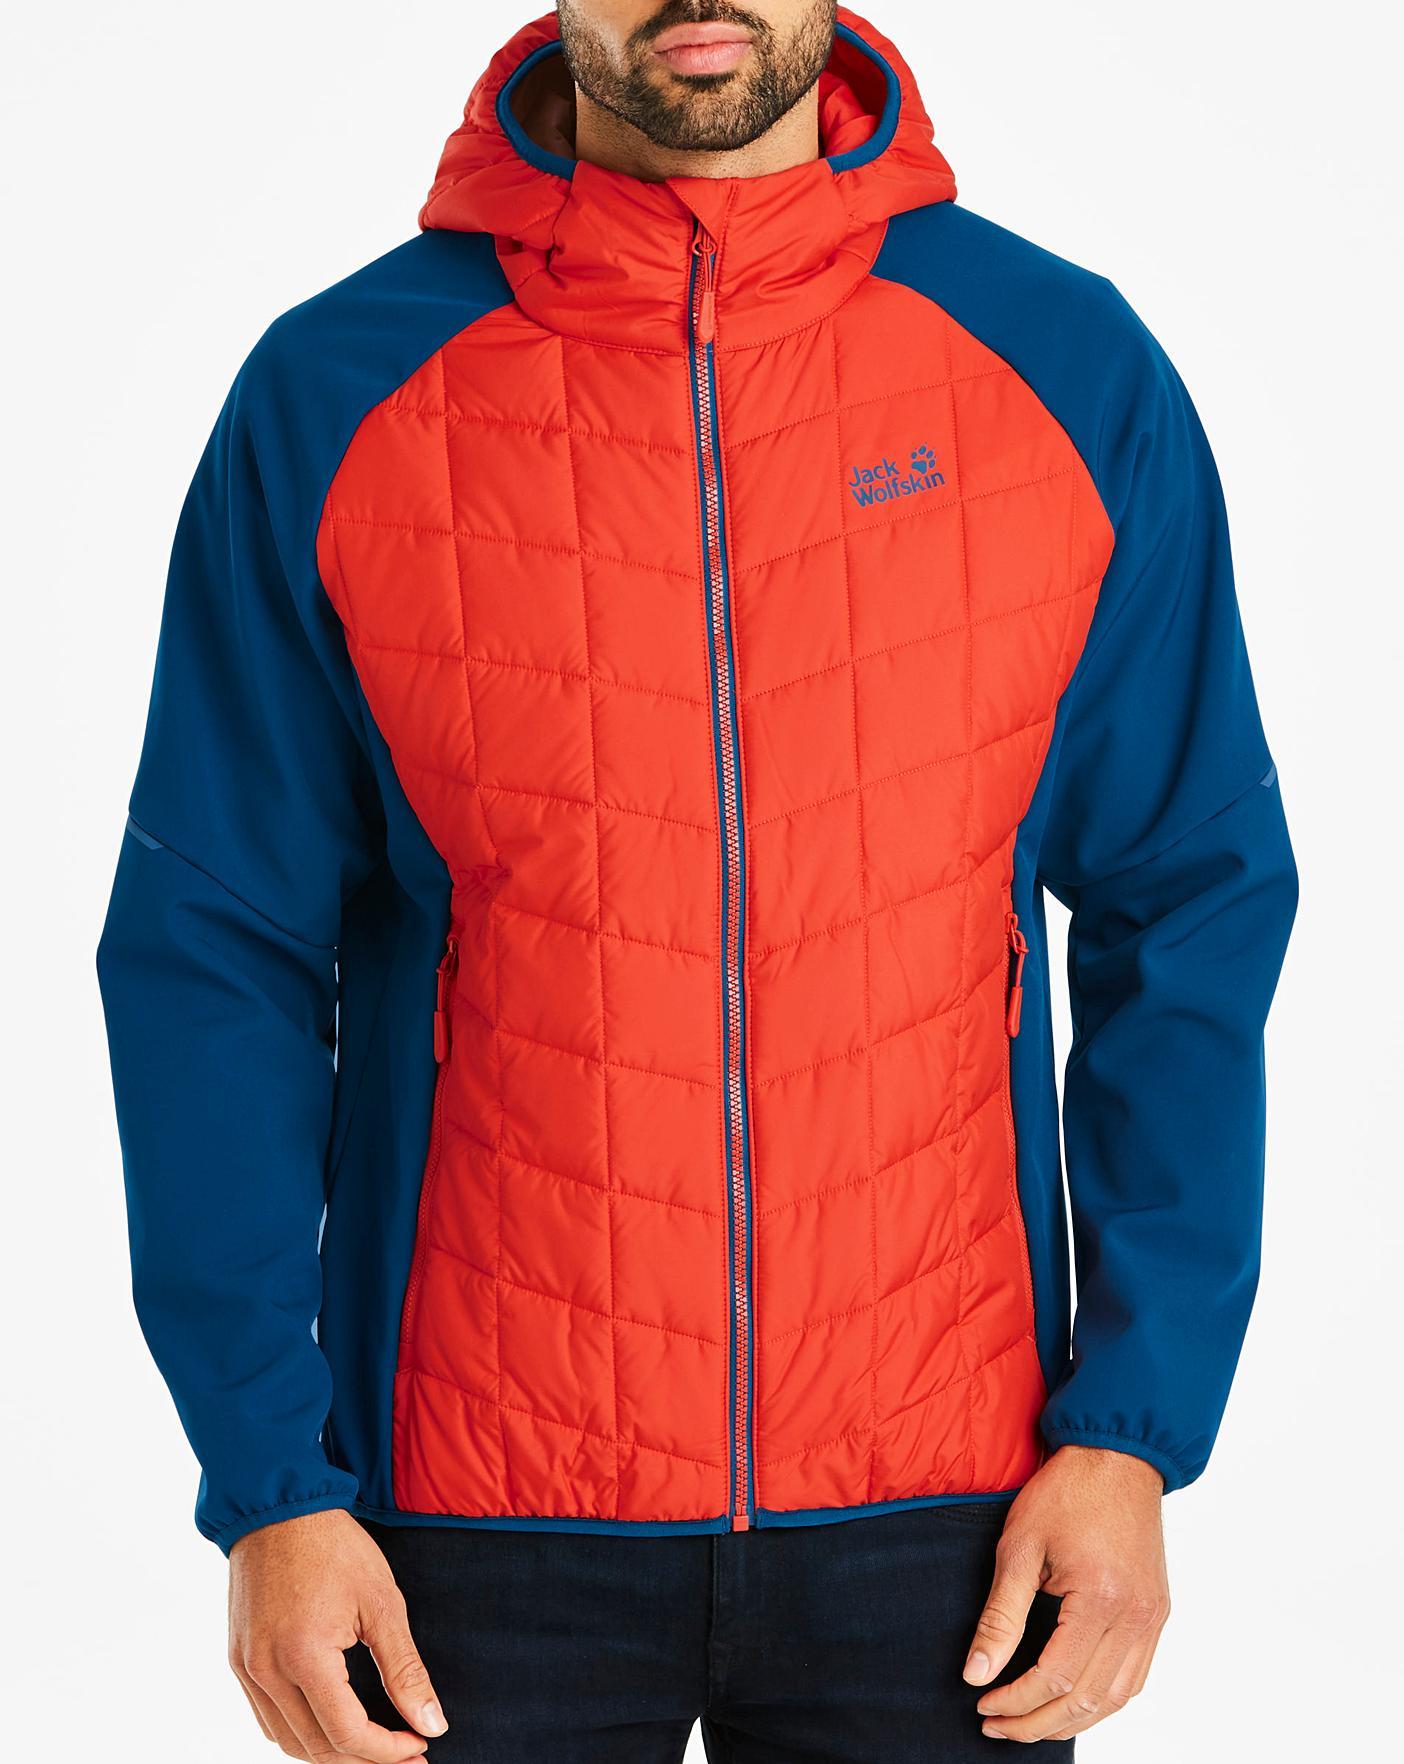 Jack Wolfskin Grassland Hybrid Jacket